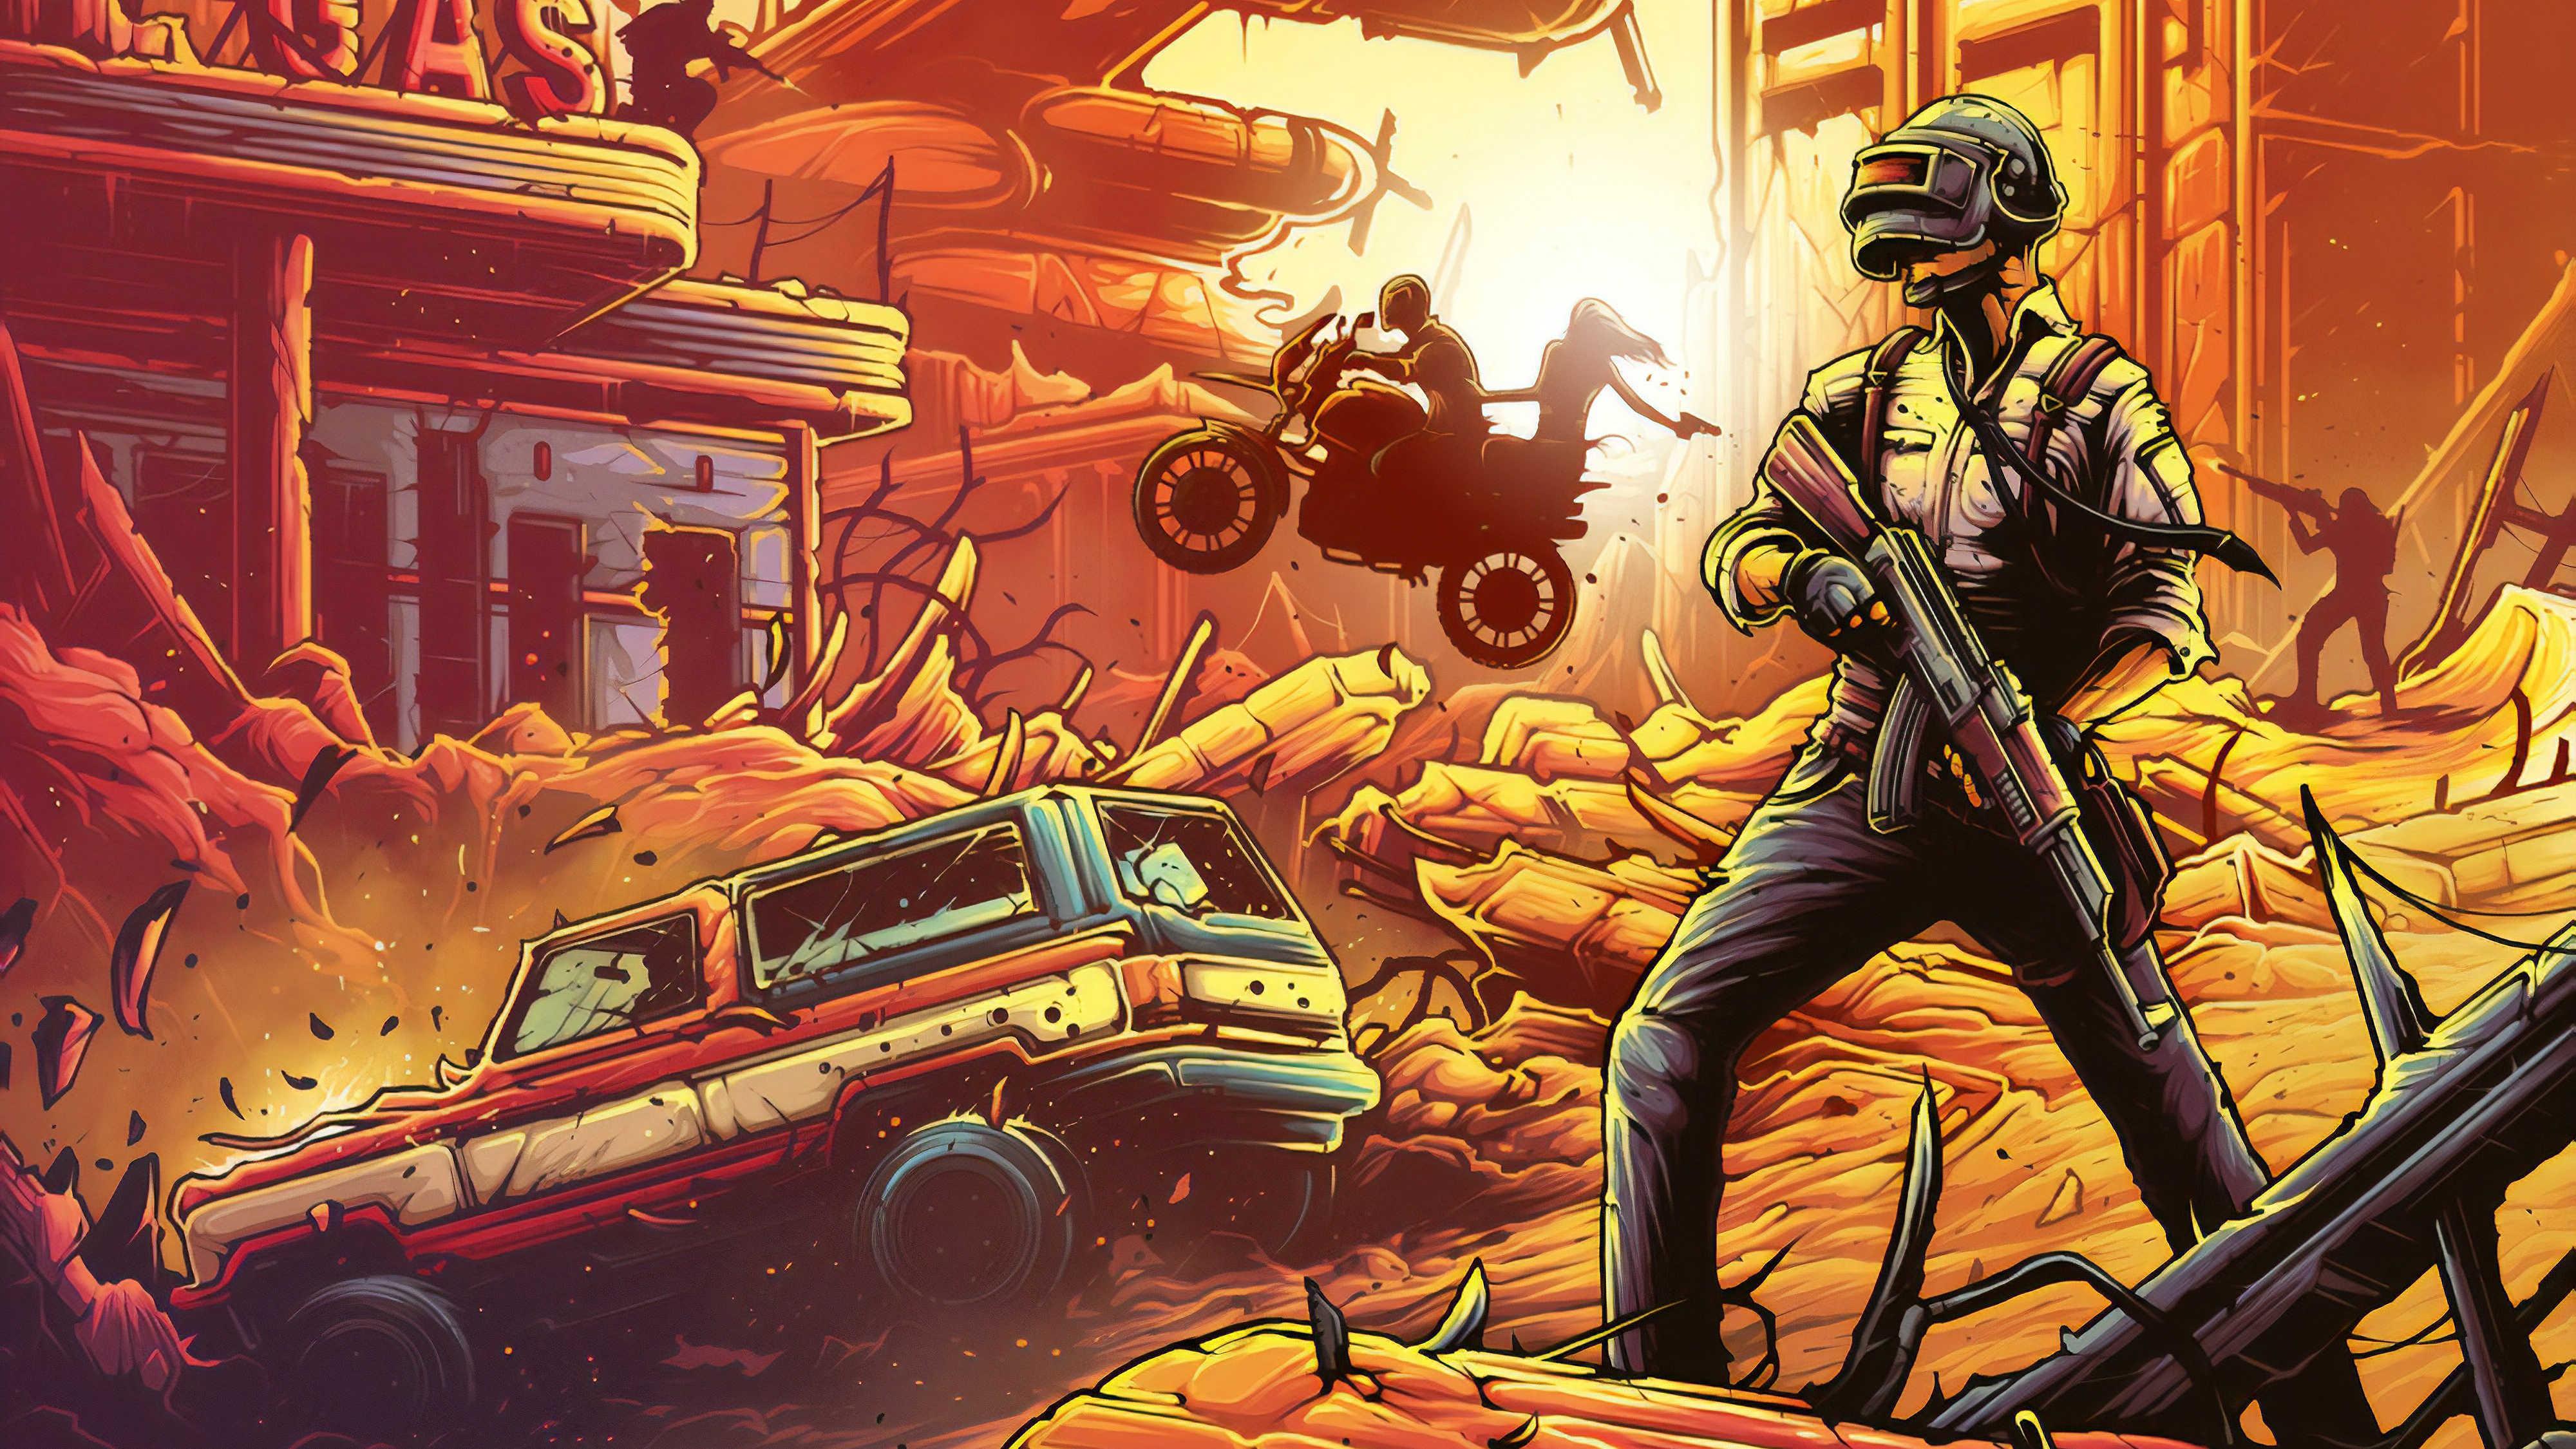 Pubg Dark Helmet Man Hd Games 4k Wallpaper Image Background 4k